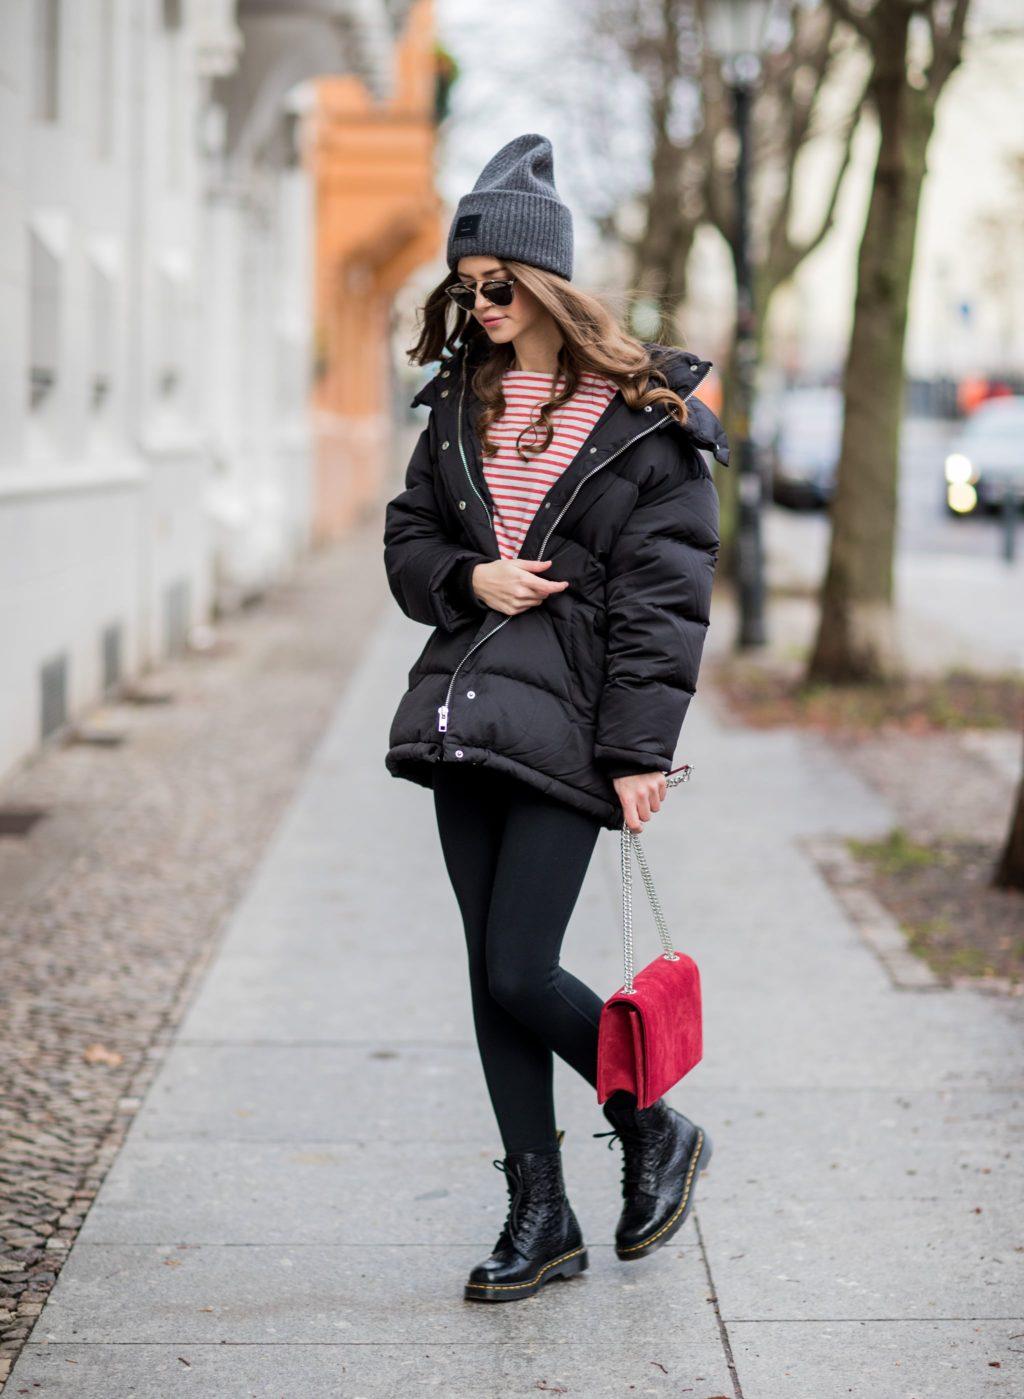 Legging-2-1024x1399 140+ Lovely Women's Outfit Ideas for Winter 2020 / 2021